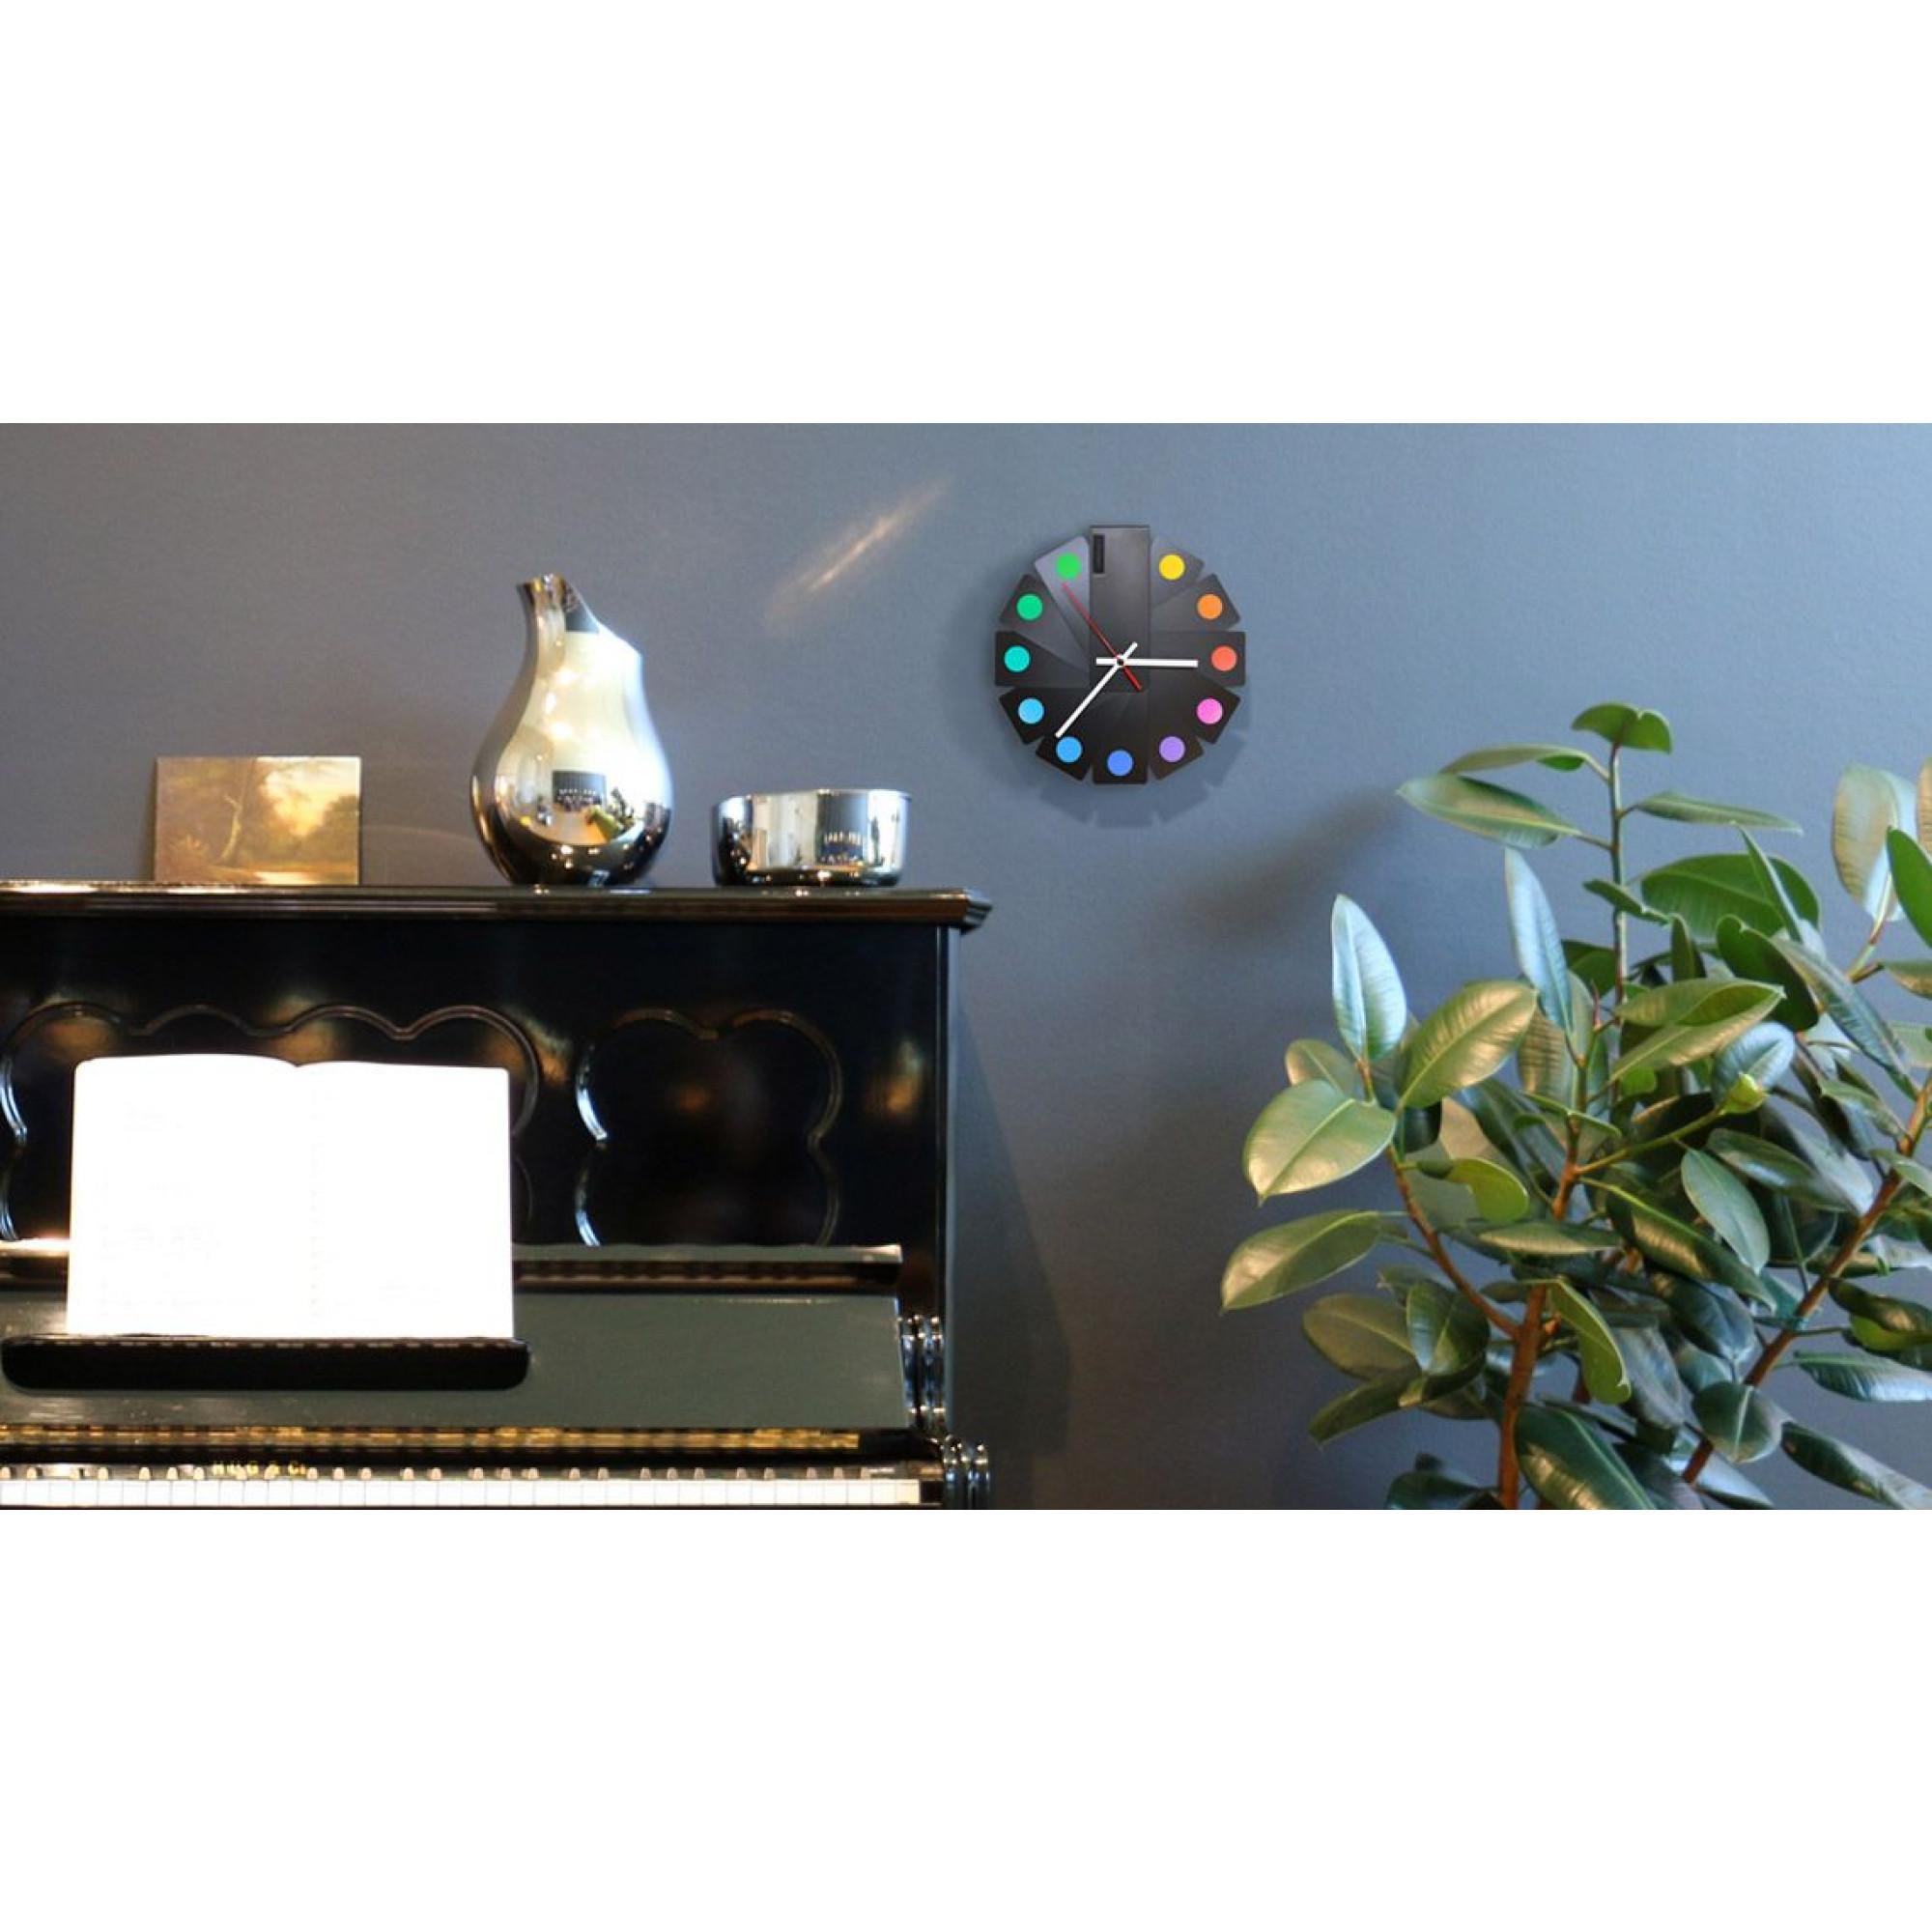 Desk/Wall Foldable Analog Clock Transformer | Black & Spots